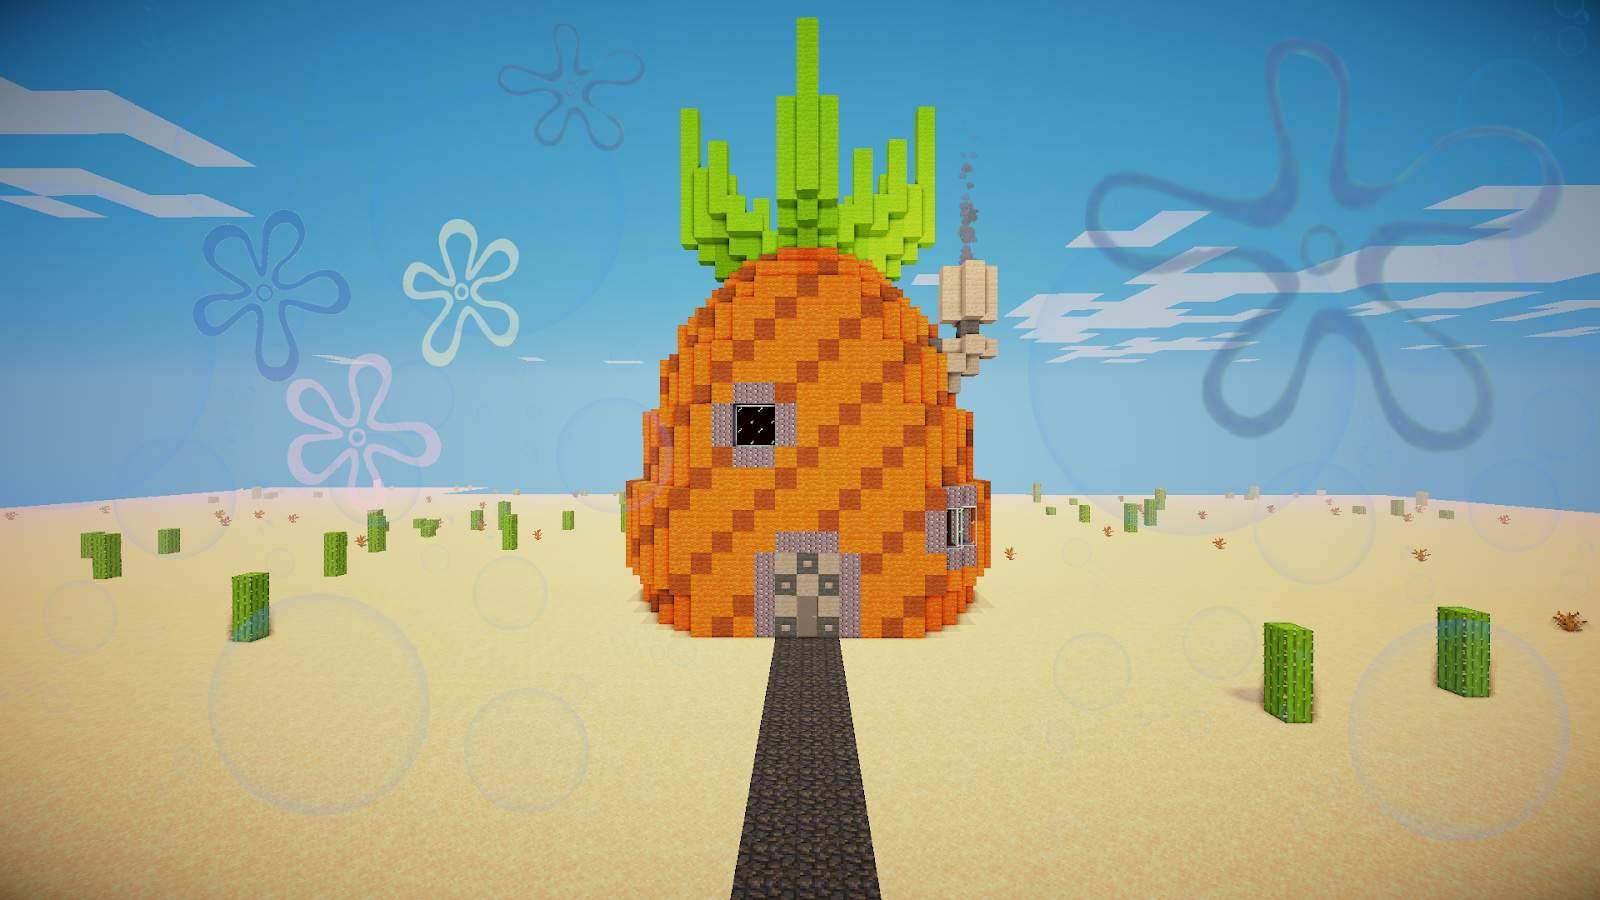 Spongebob Pineapple House  Minecraft Amino